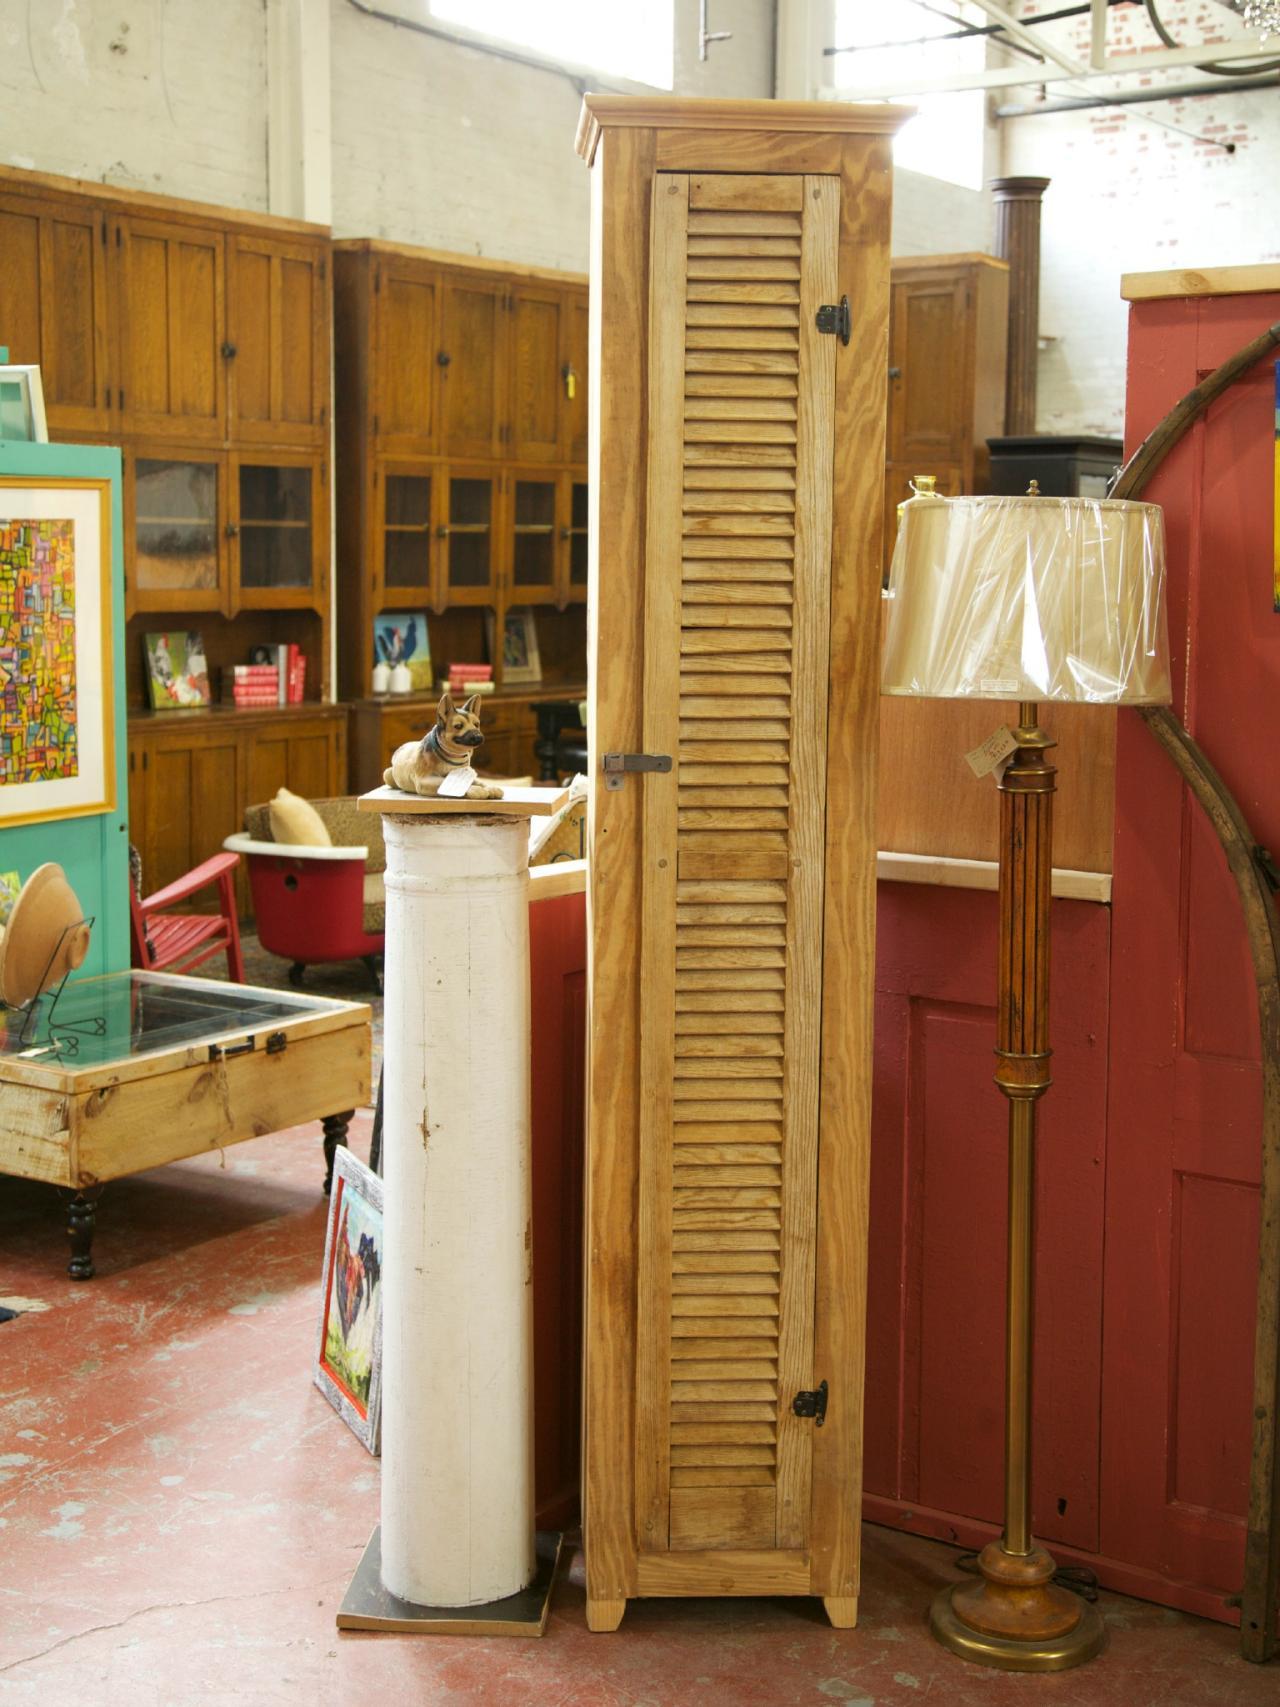 Mike whiteside diy 6 floor lamp with vintage books solutioingenieria Gallery